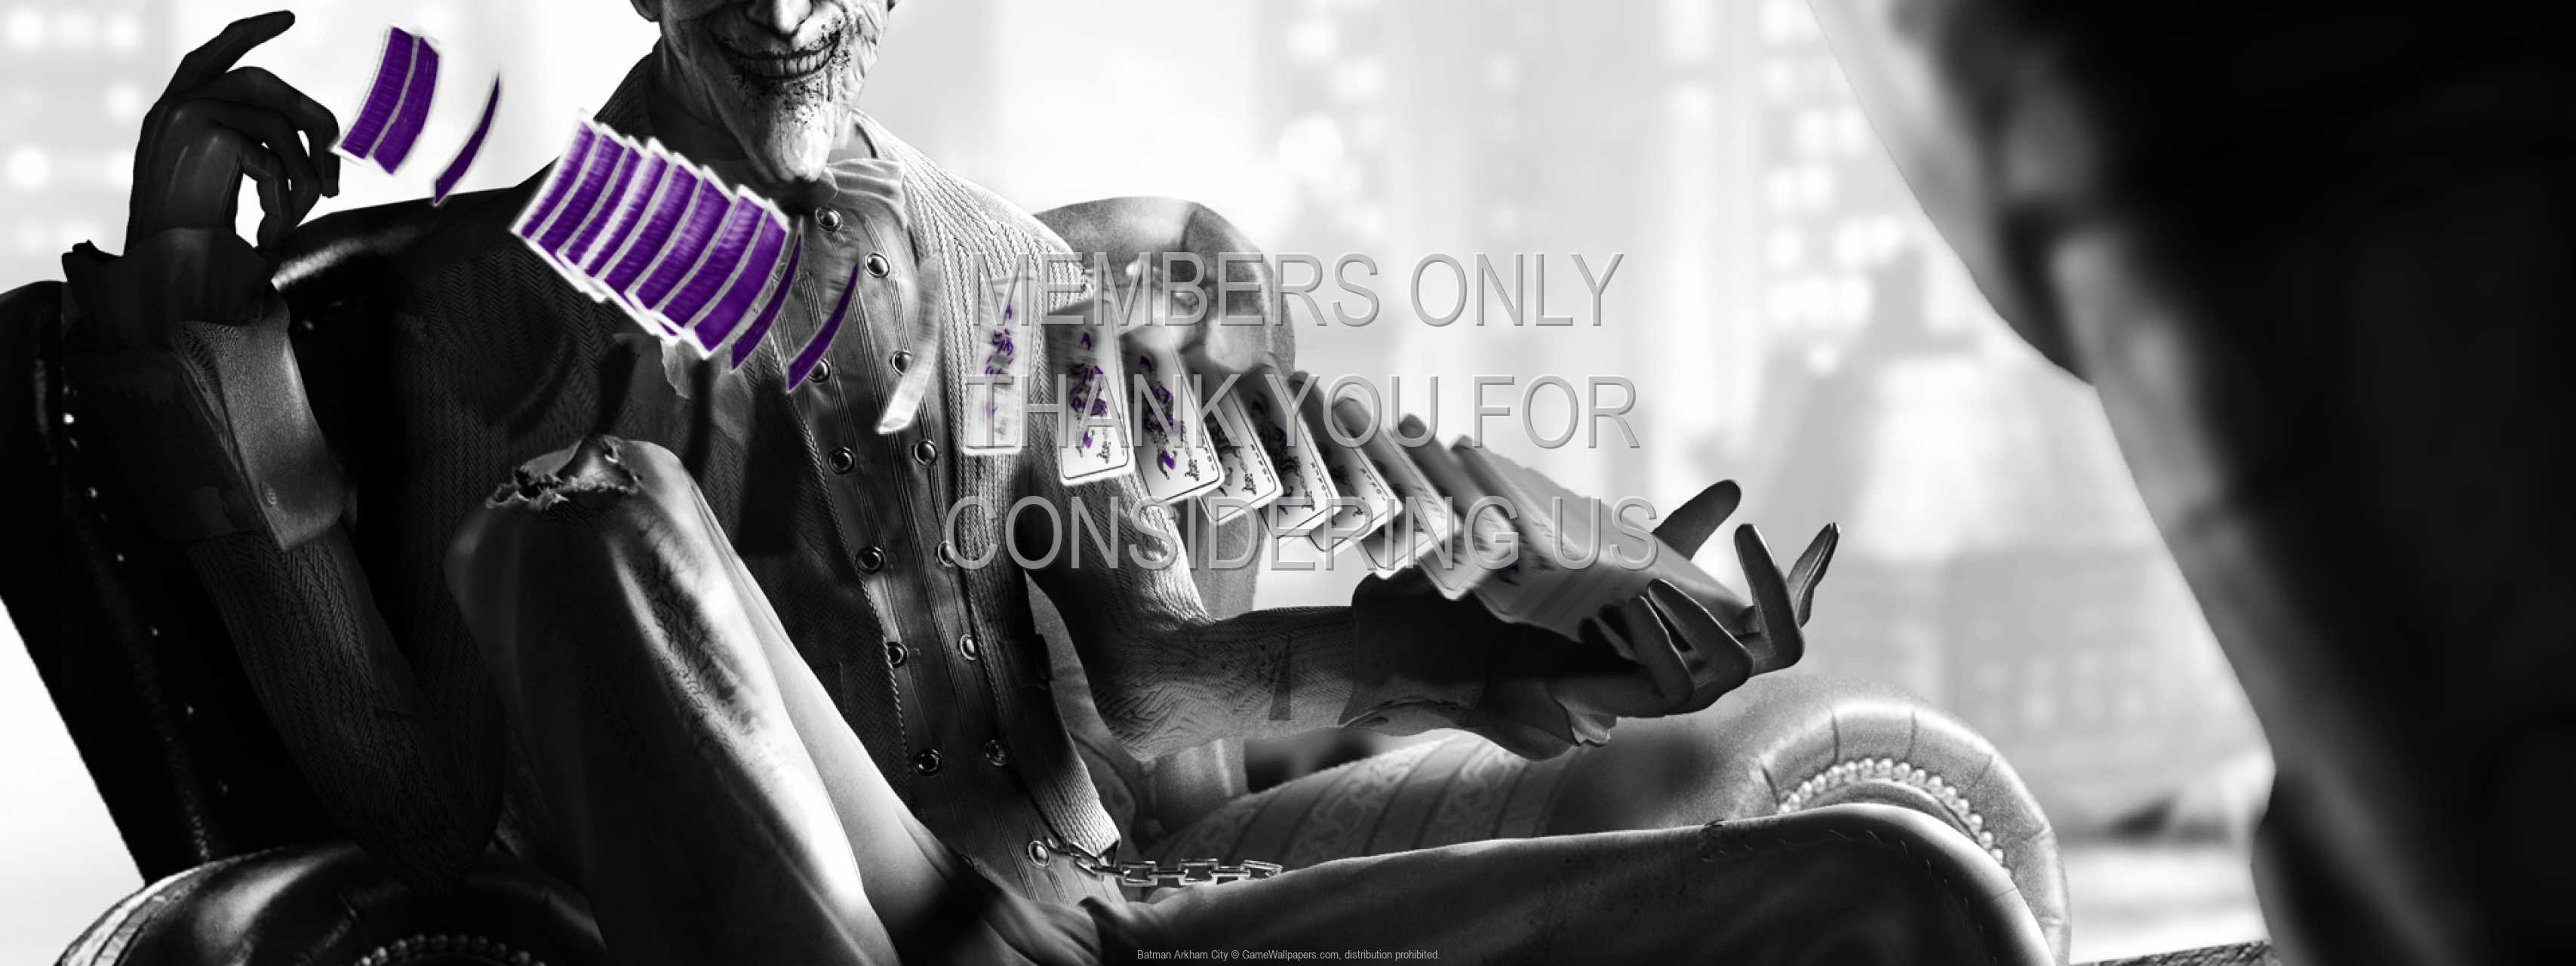 Batman: Arkham City 720p Horizontal Mobile wallpaper or background 03